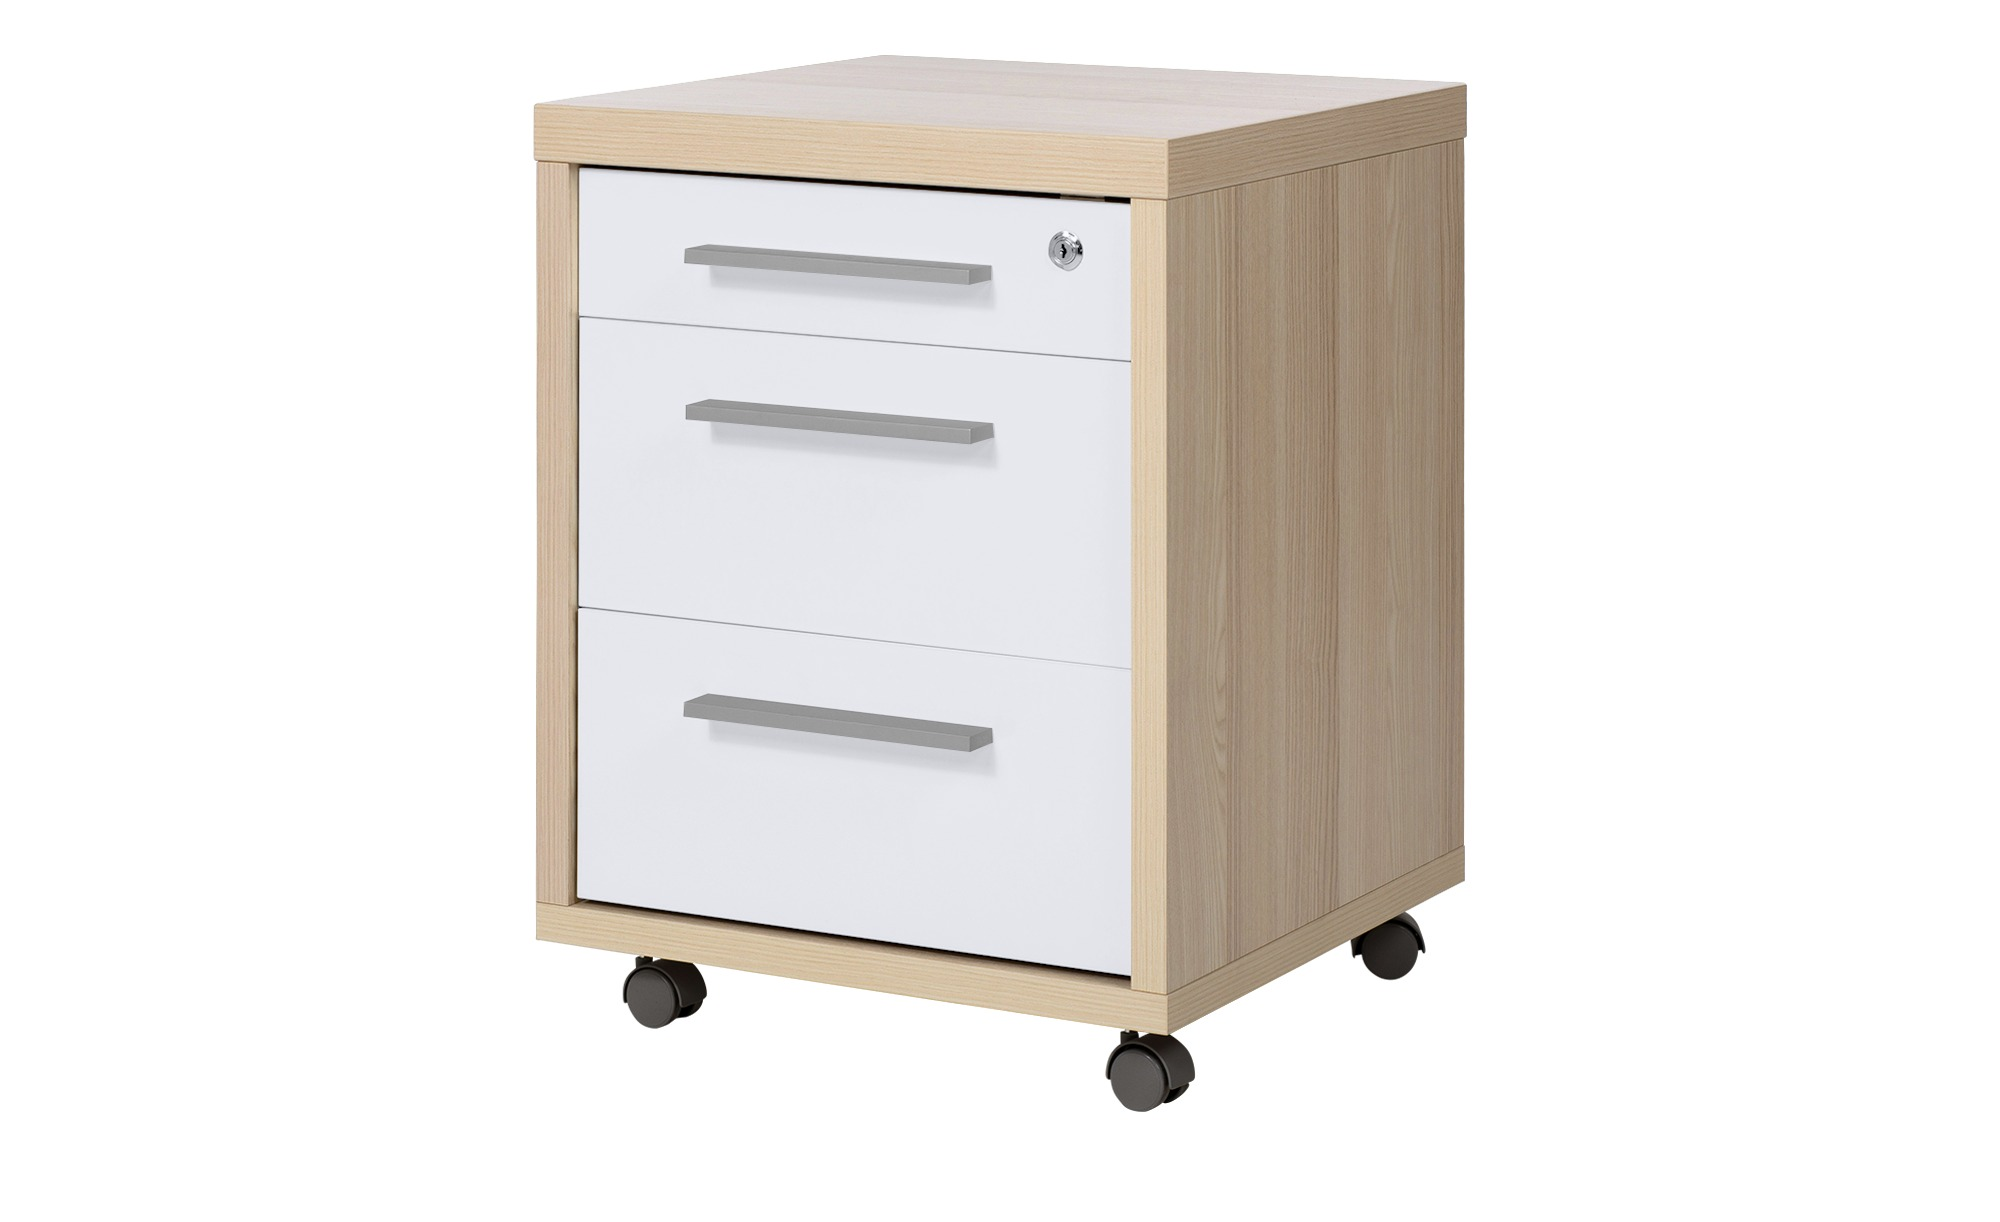 Rollcontainer - holzfarben - 47 cm - 61,5 cm - 45 cm - Sconto | Büro > Büroschränke > Rollcontainer | Sconto